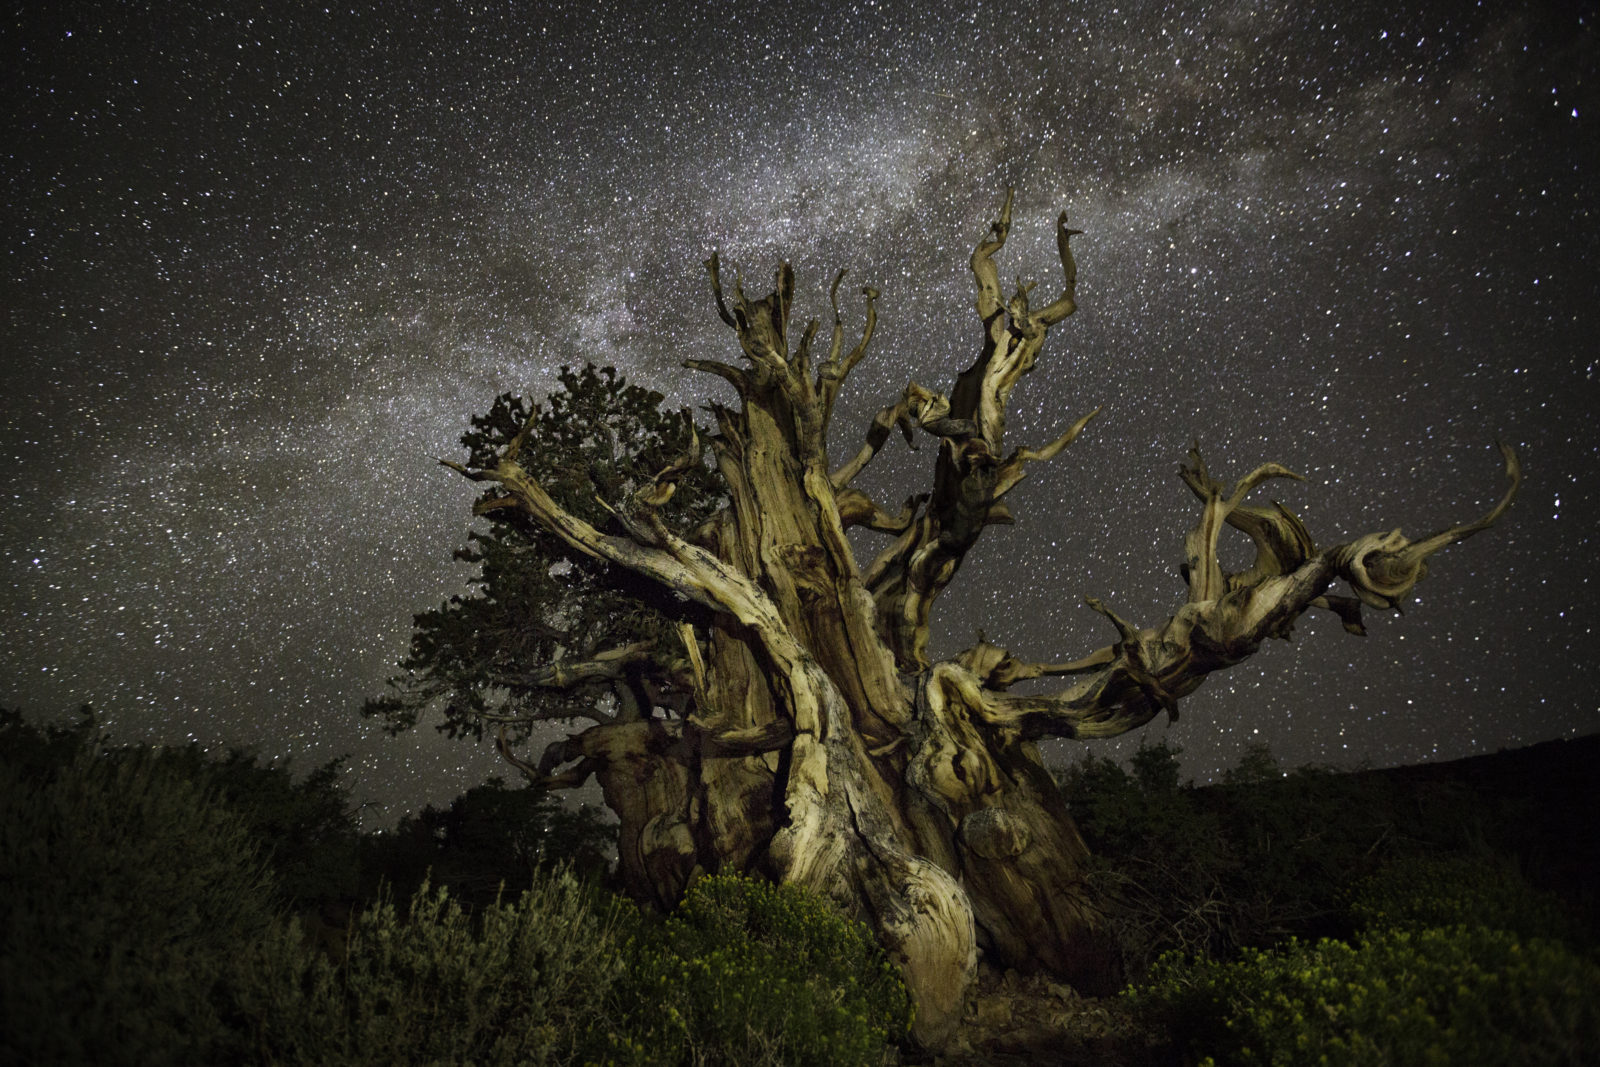 Beth Moon: Diamond Nights, California